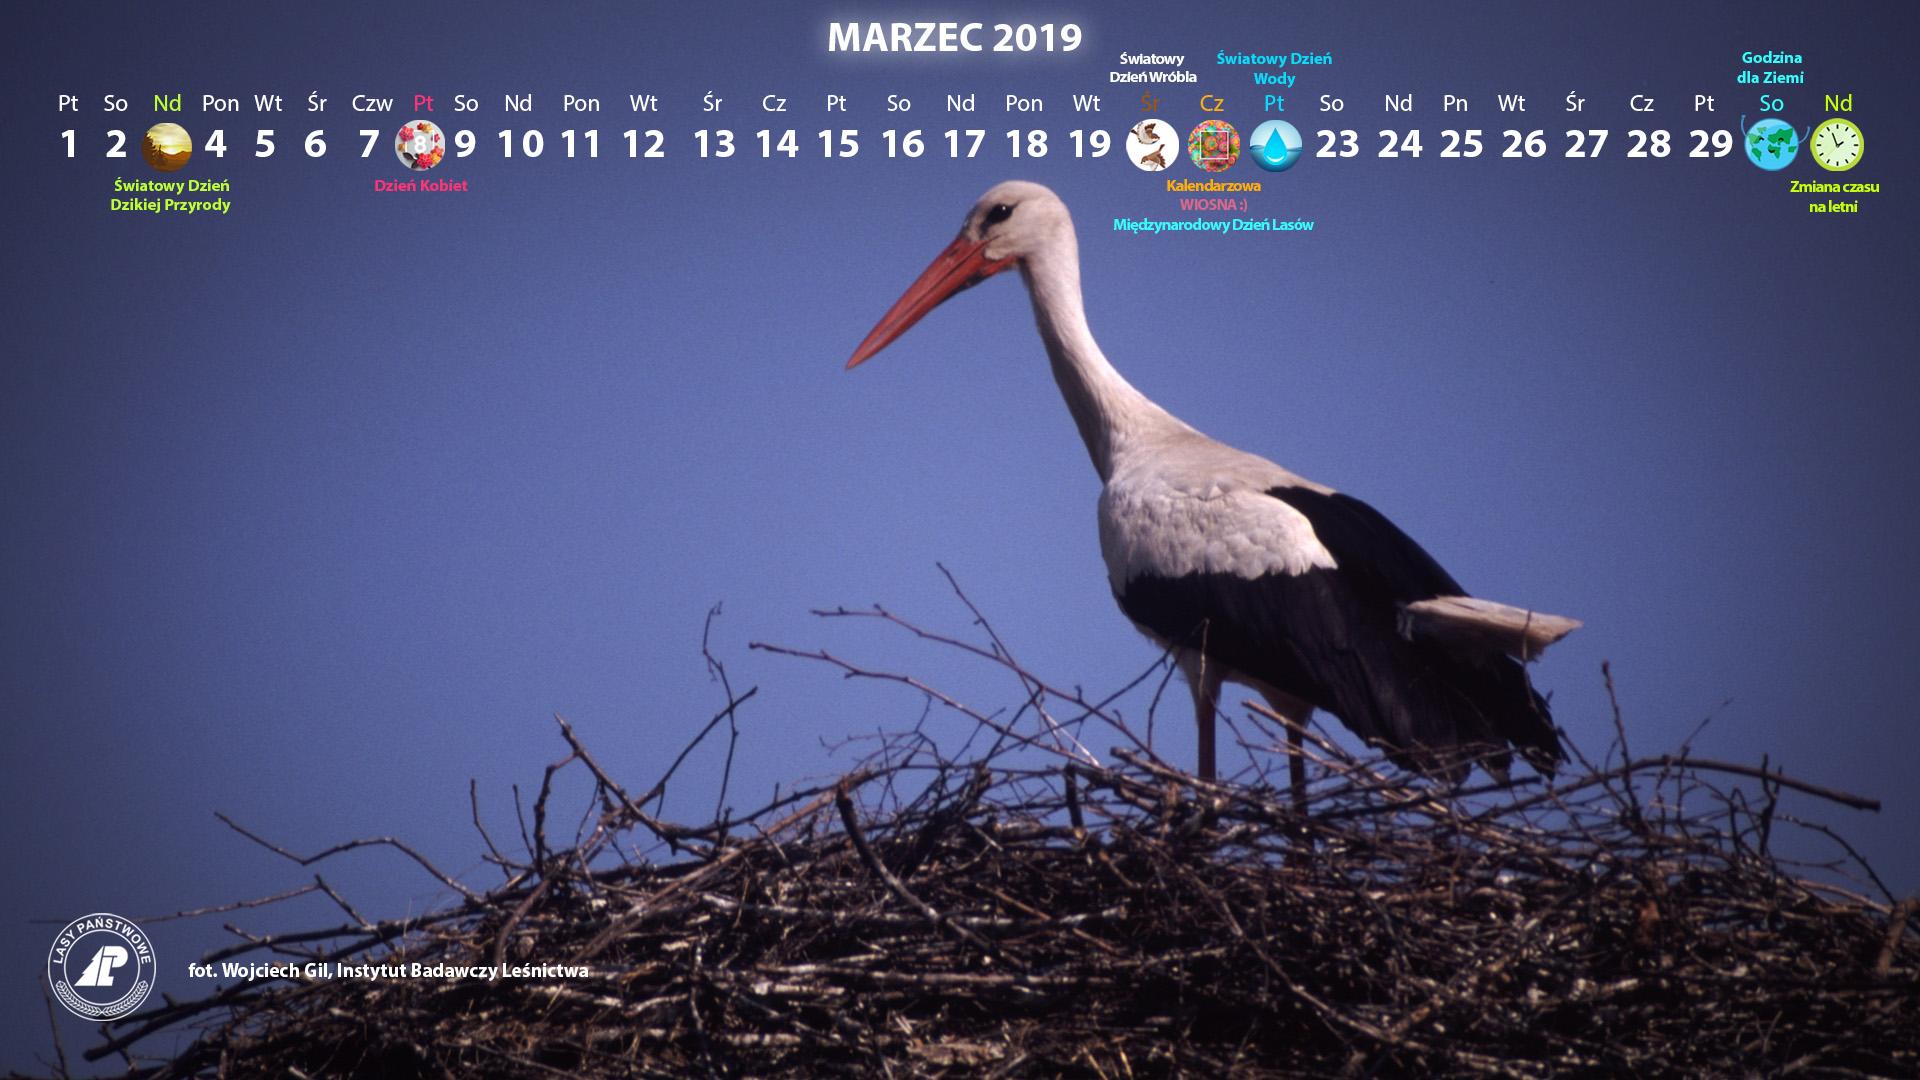 Kalendarz_marzec_2019_1920x1080[1].jpg